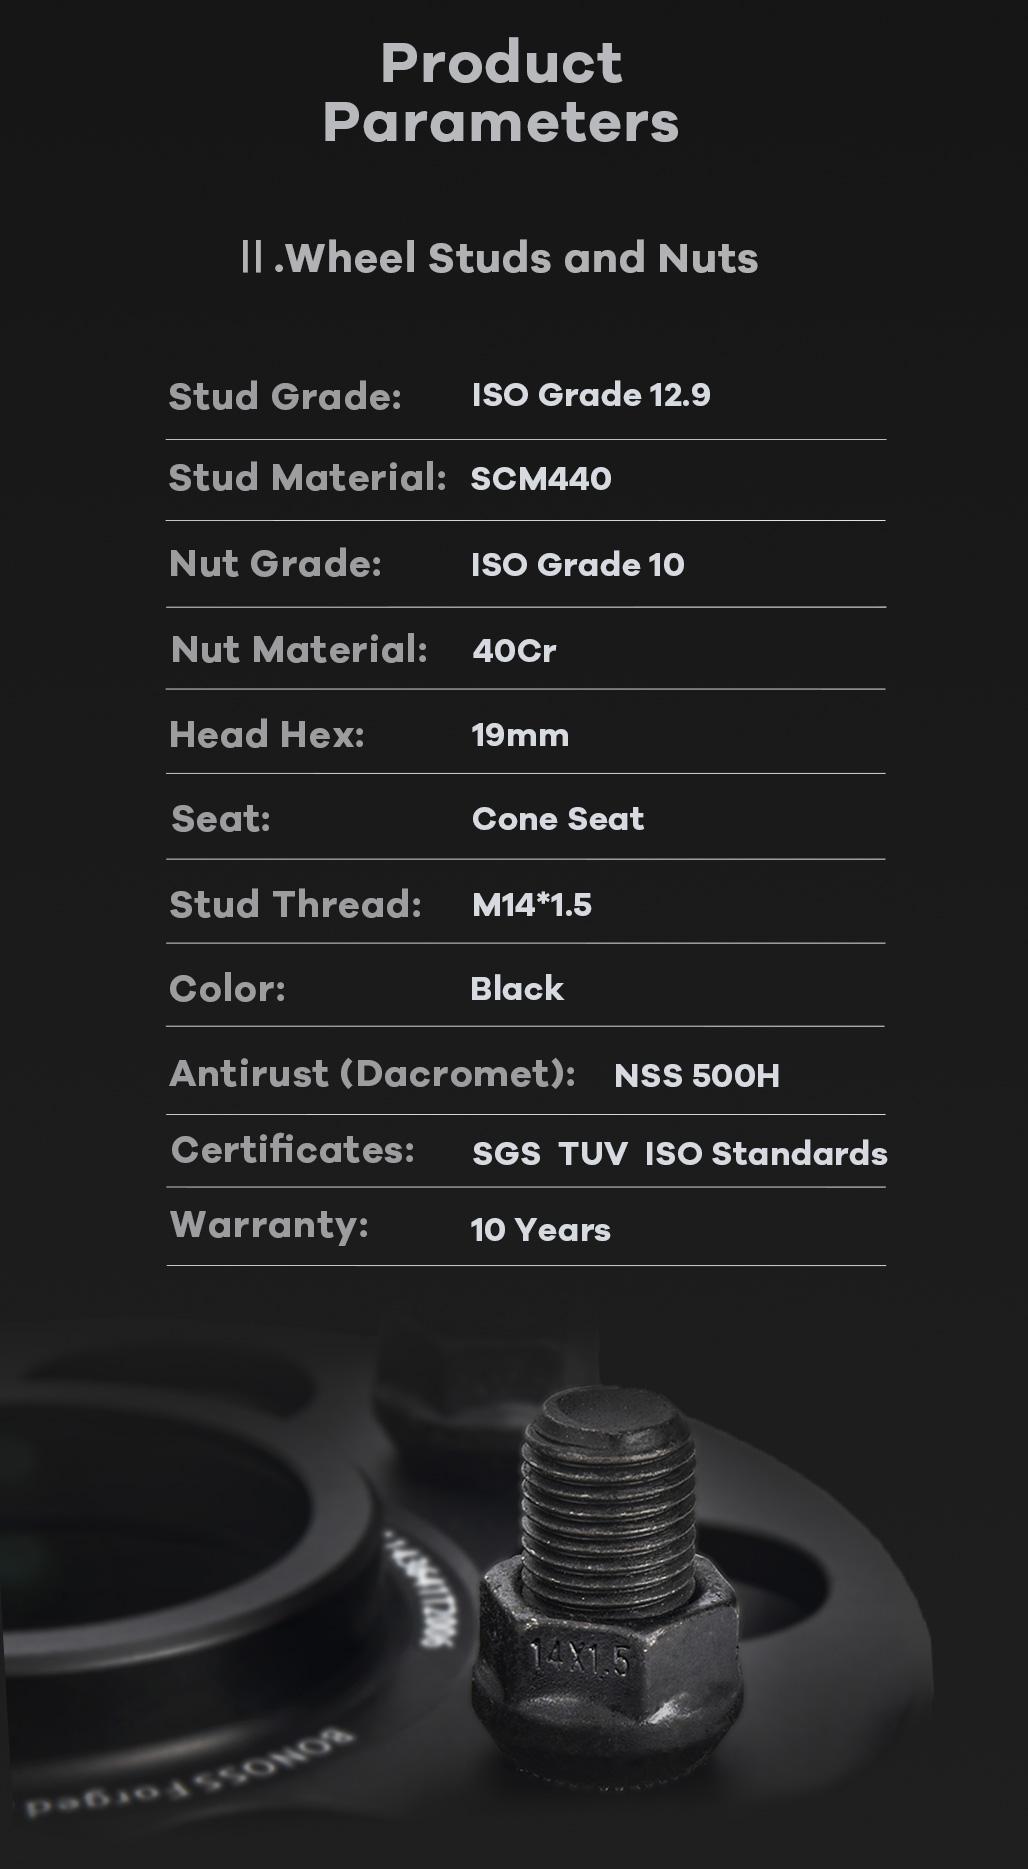 BONOSS-iso-grade-10-lug-nuts-for-nissan-350z-370z-5x114.3-66.1-14x1.5-by-grace-1